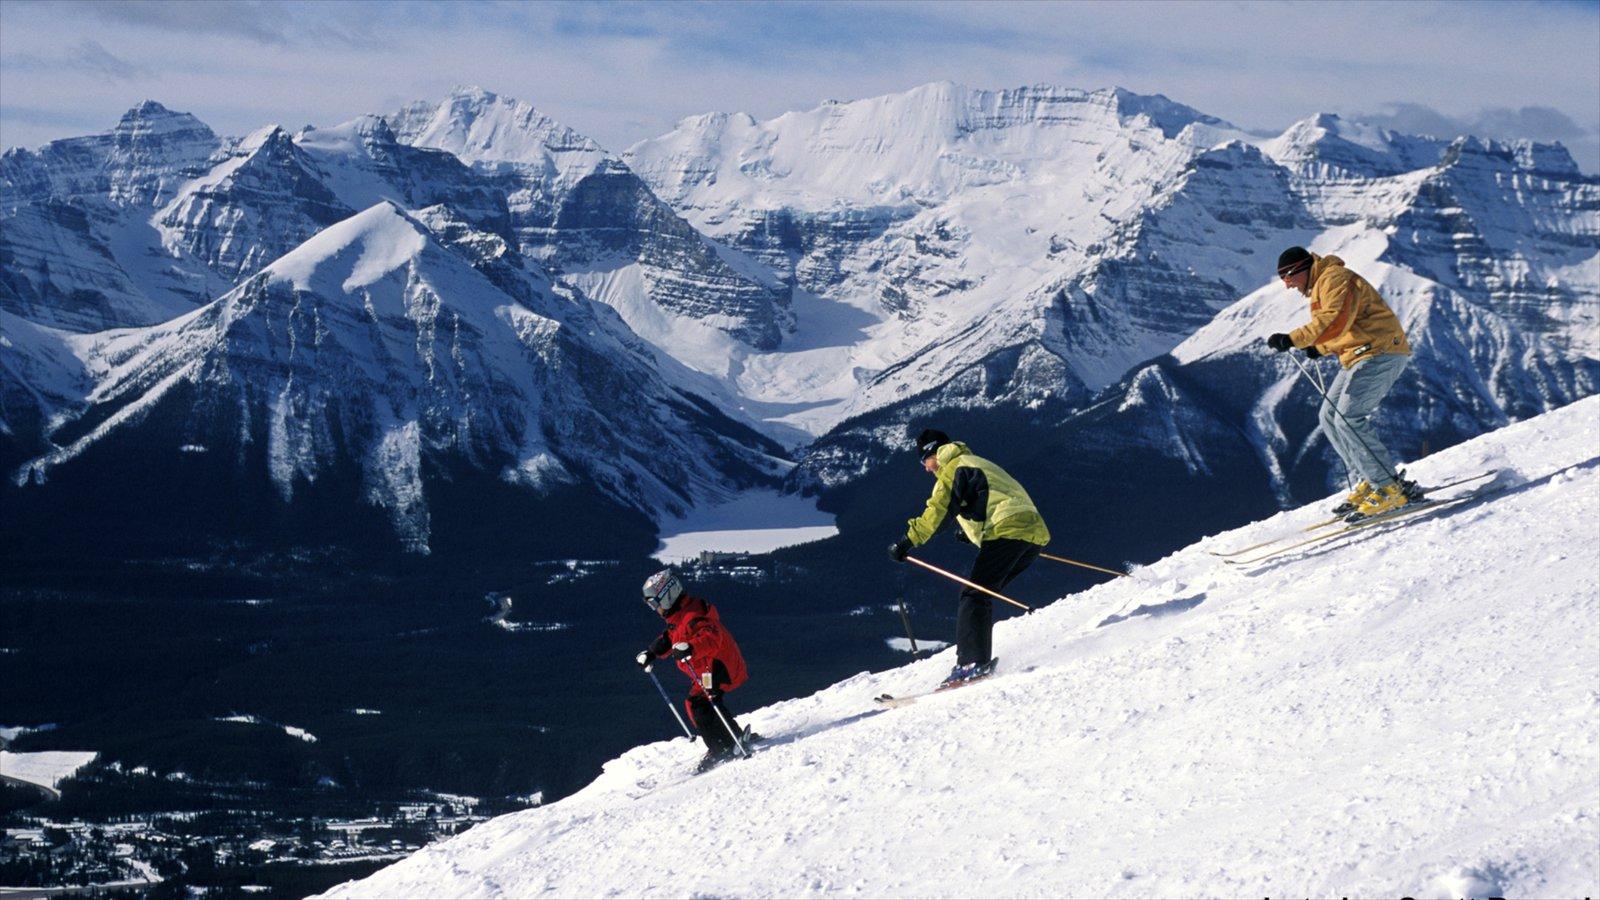 Lake Louise Mountain Resort showing snow skiing, mountains and snow